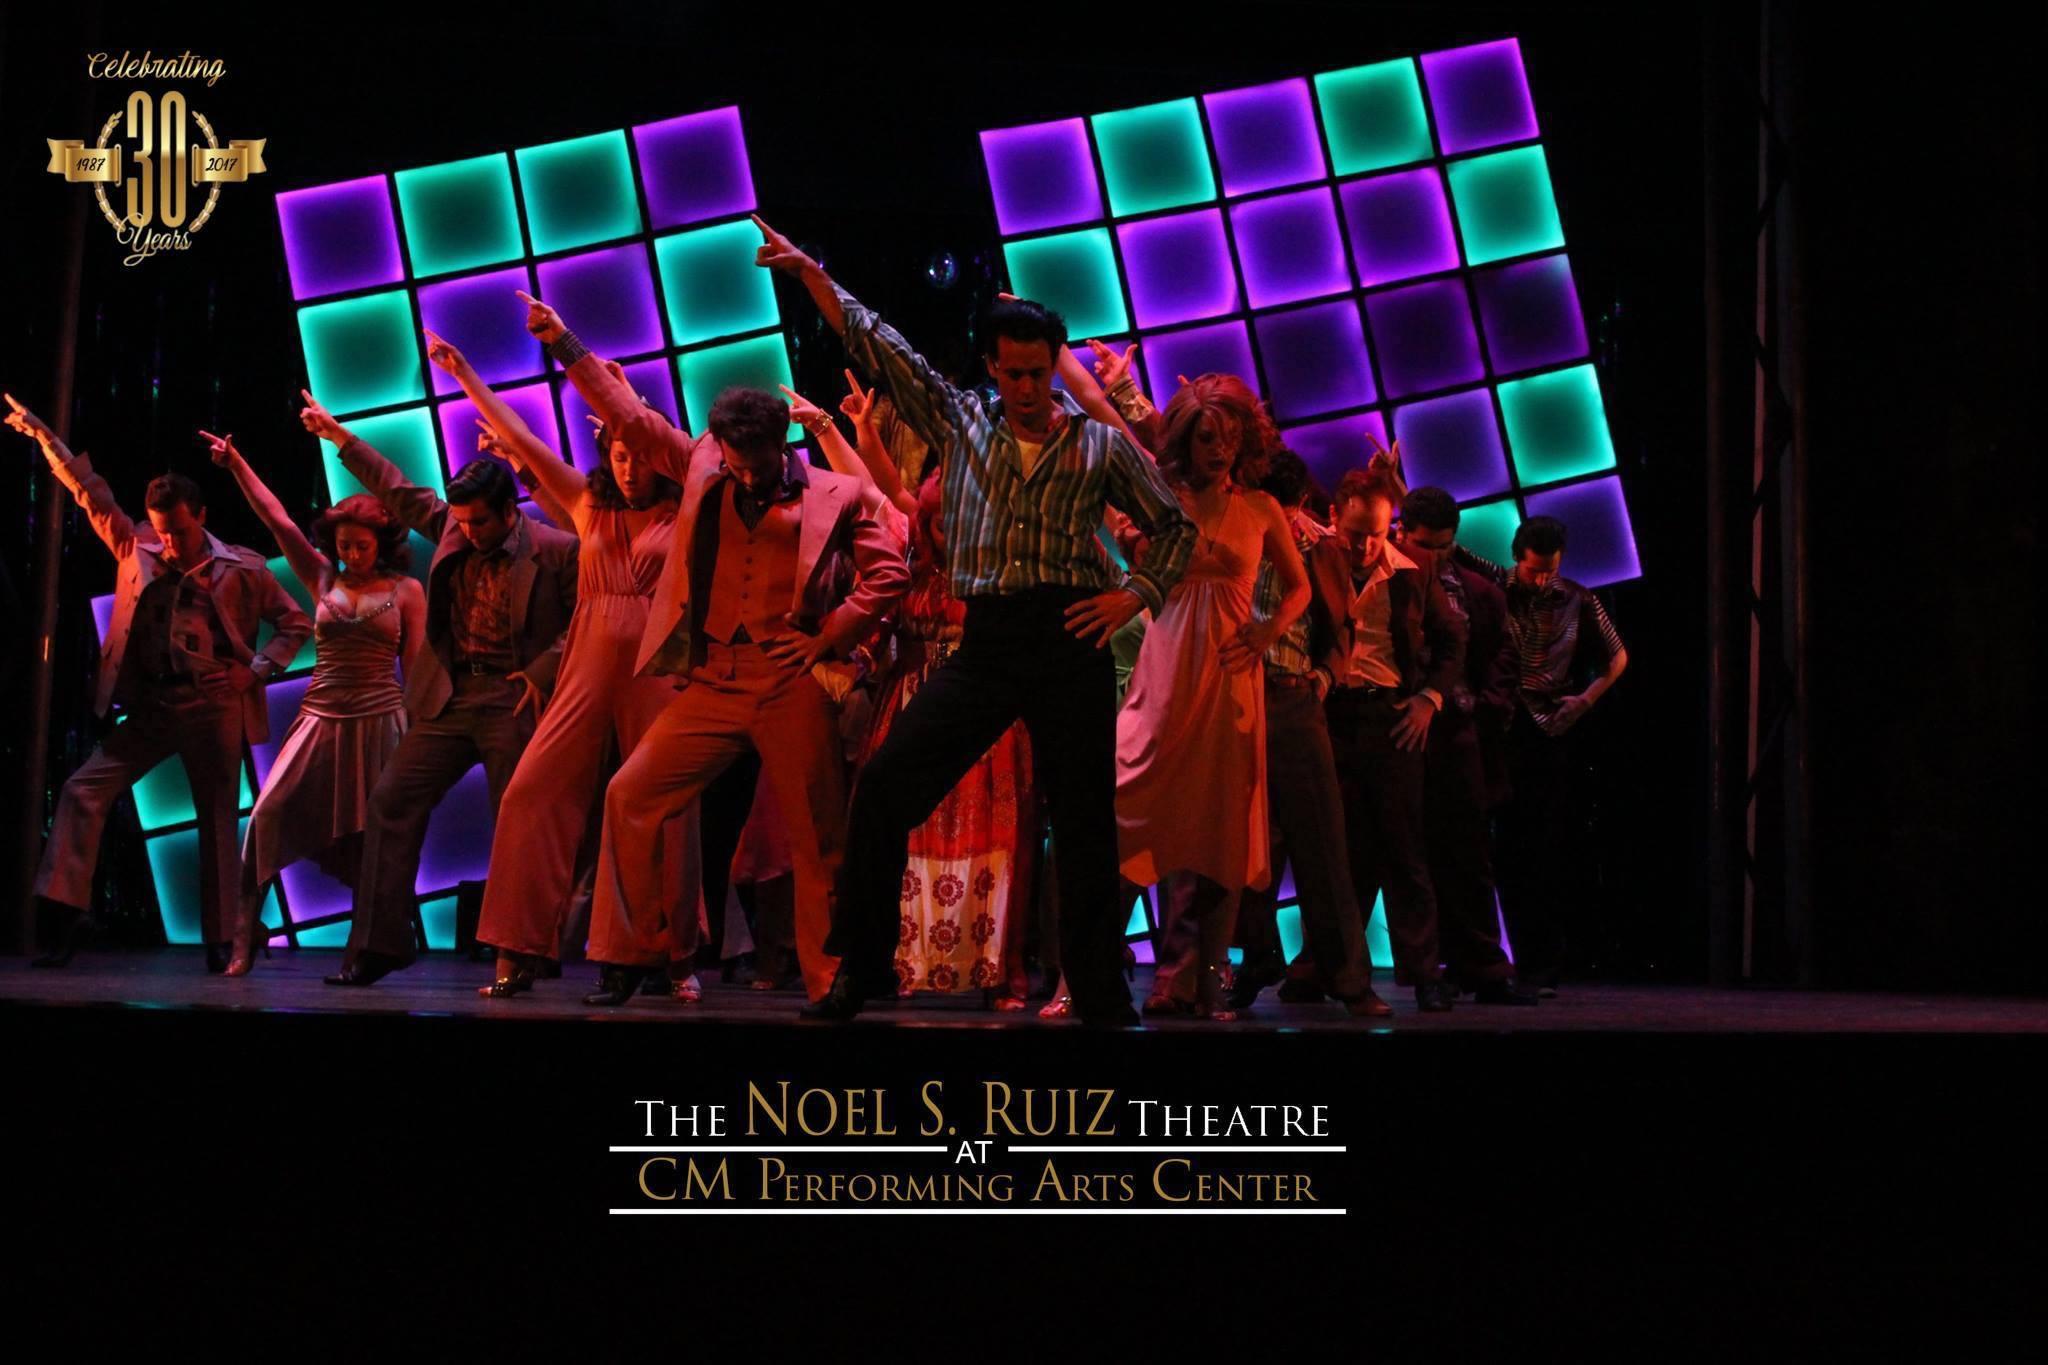 BWW Review: SATURDAY NIGHT FEVER at Noel S. Ruiz Theatre